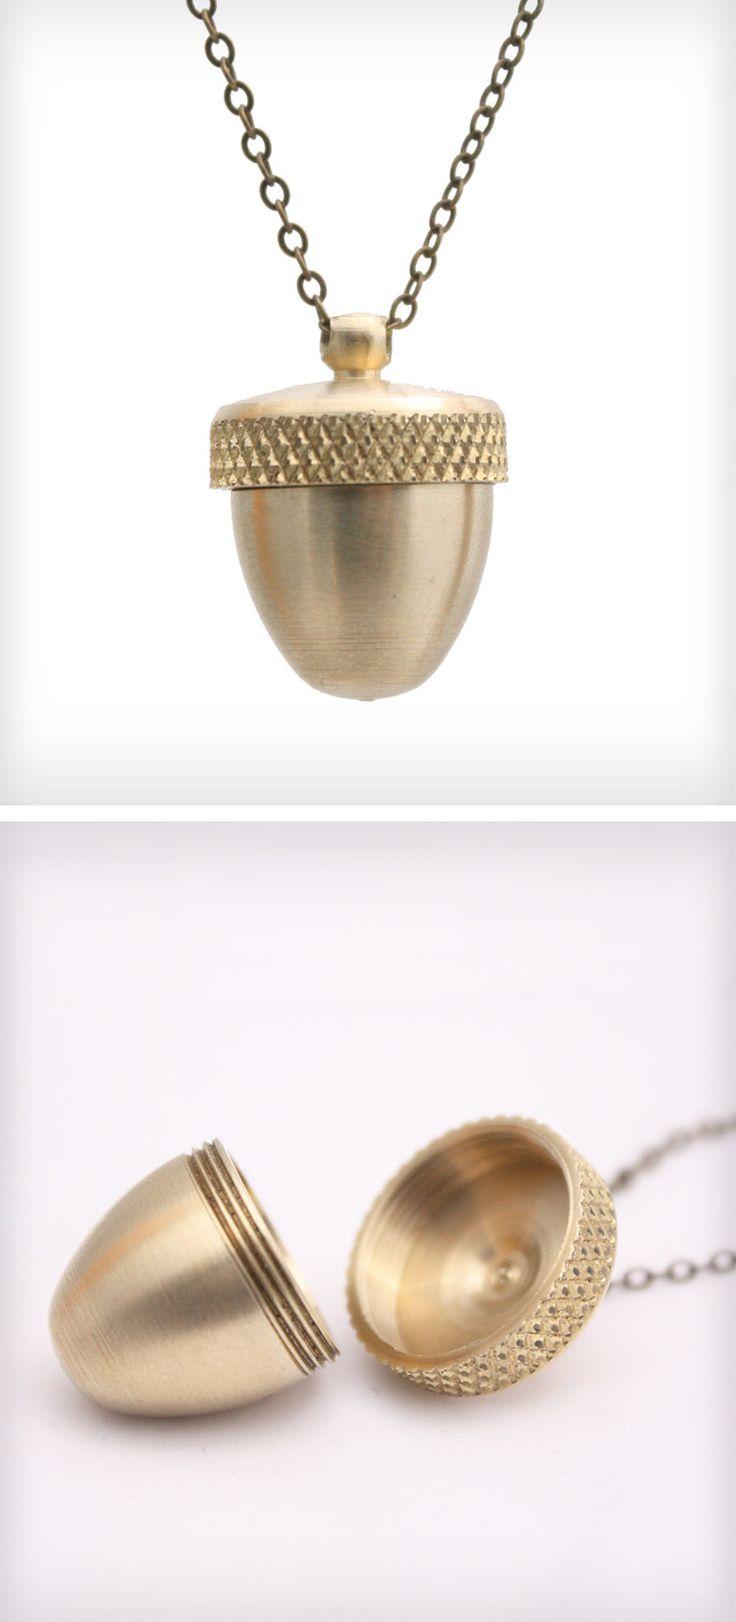 Best 20+ Acorn necklace ideas on Pinterest | Pretty necklaces ...